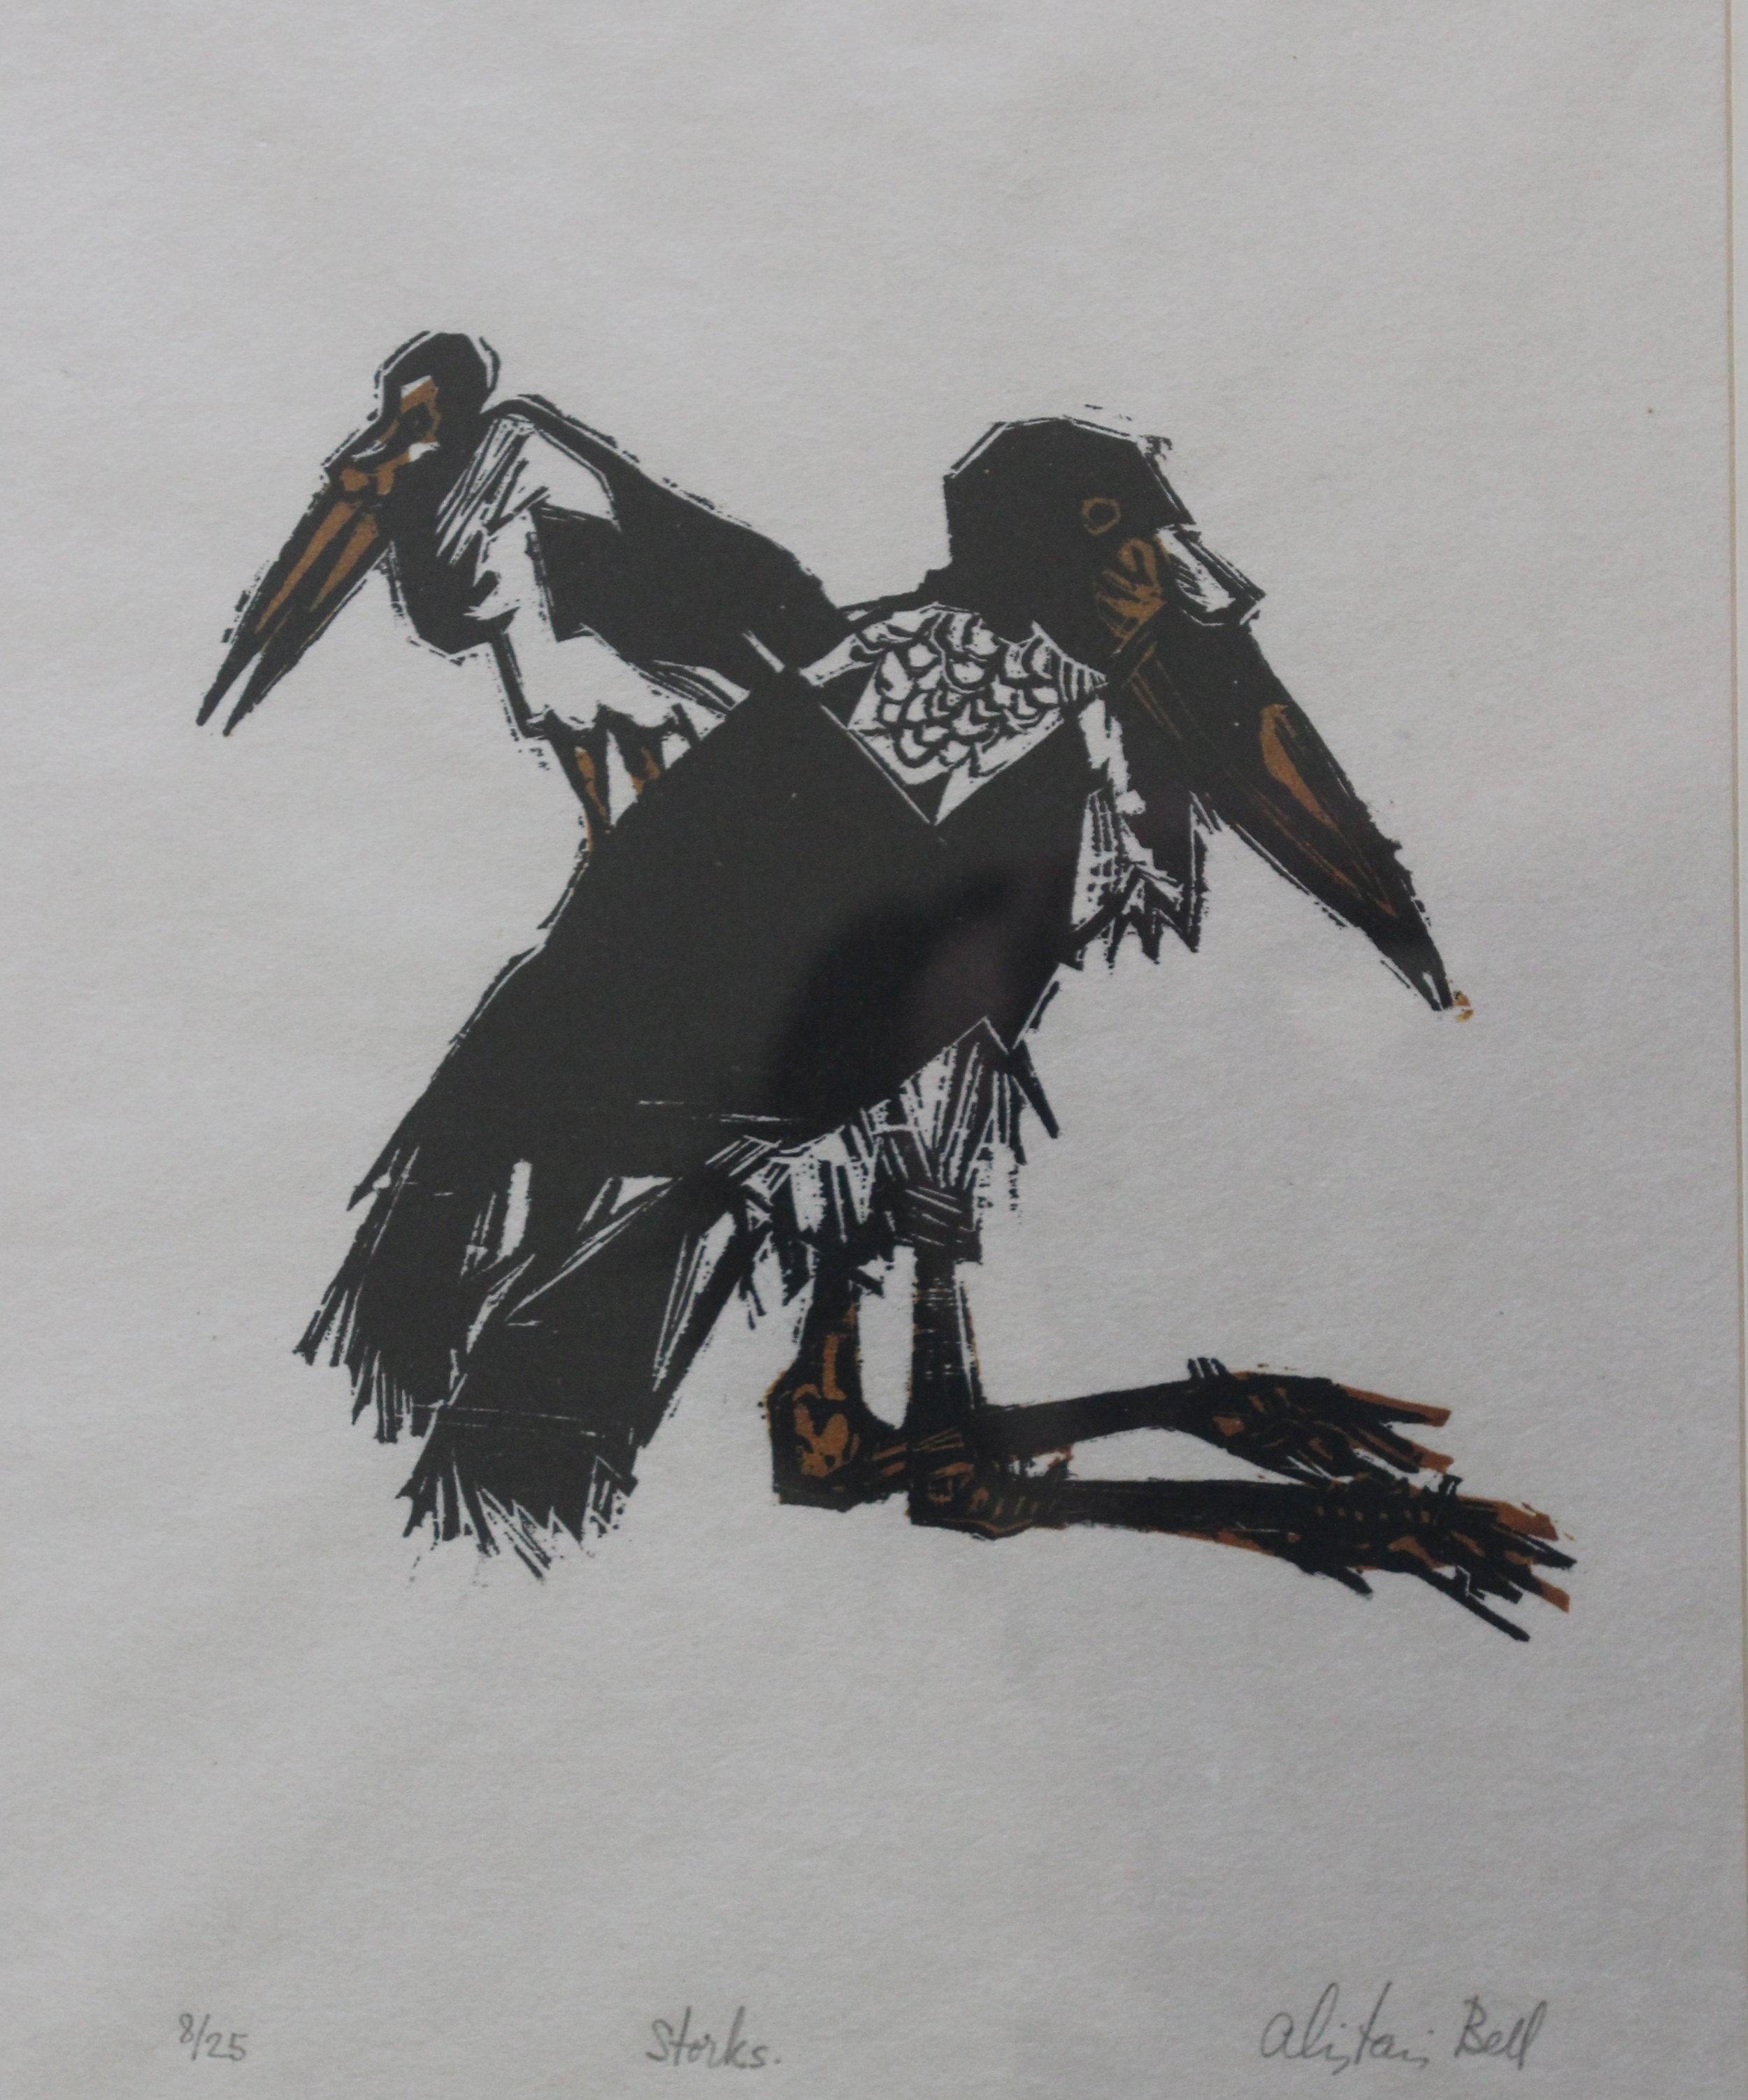 Alistair Macready Bell, Storks